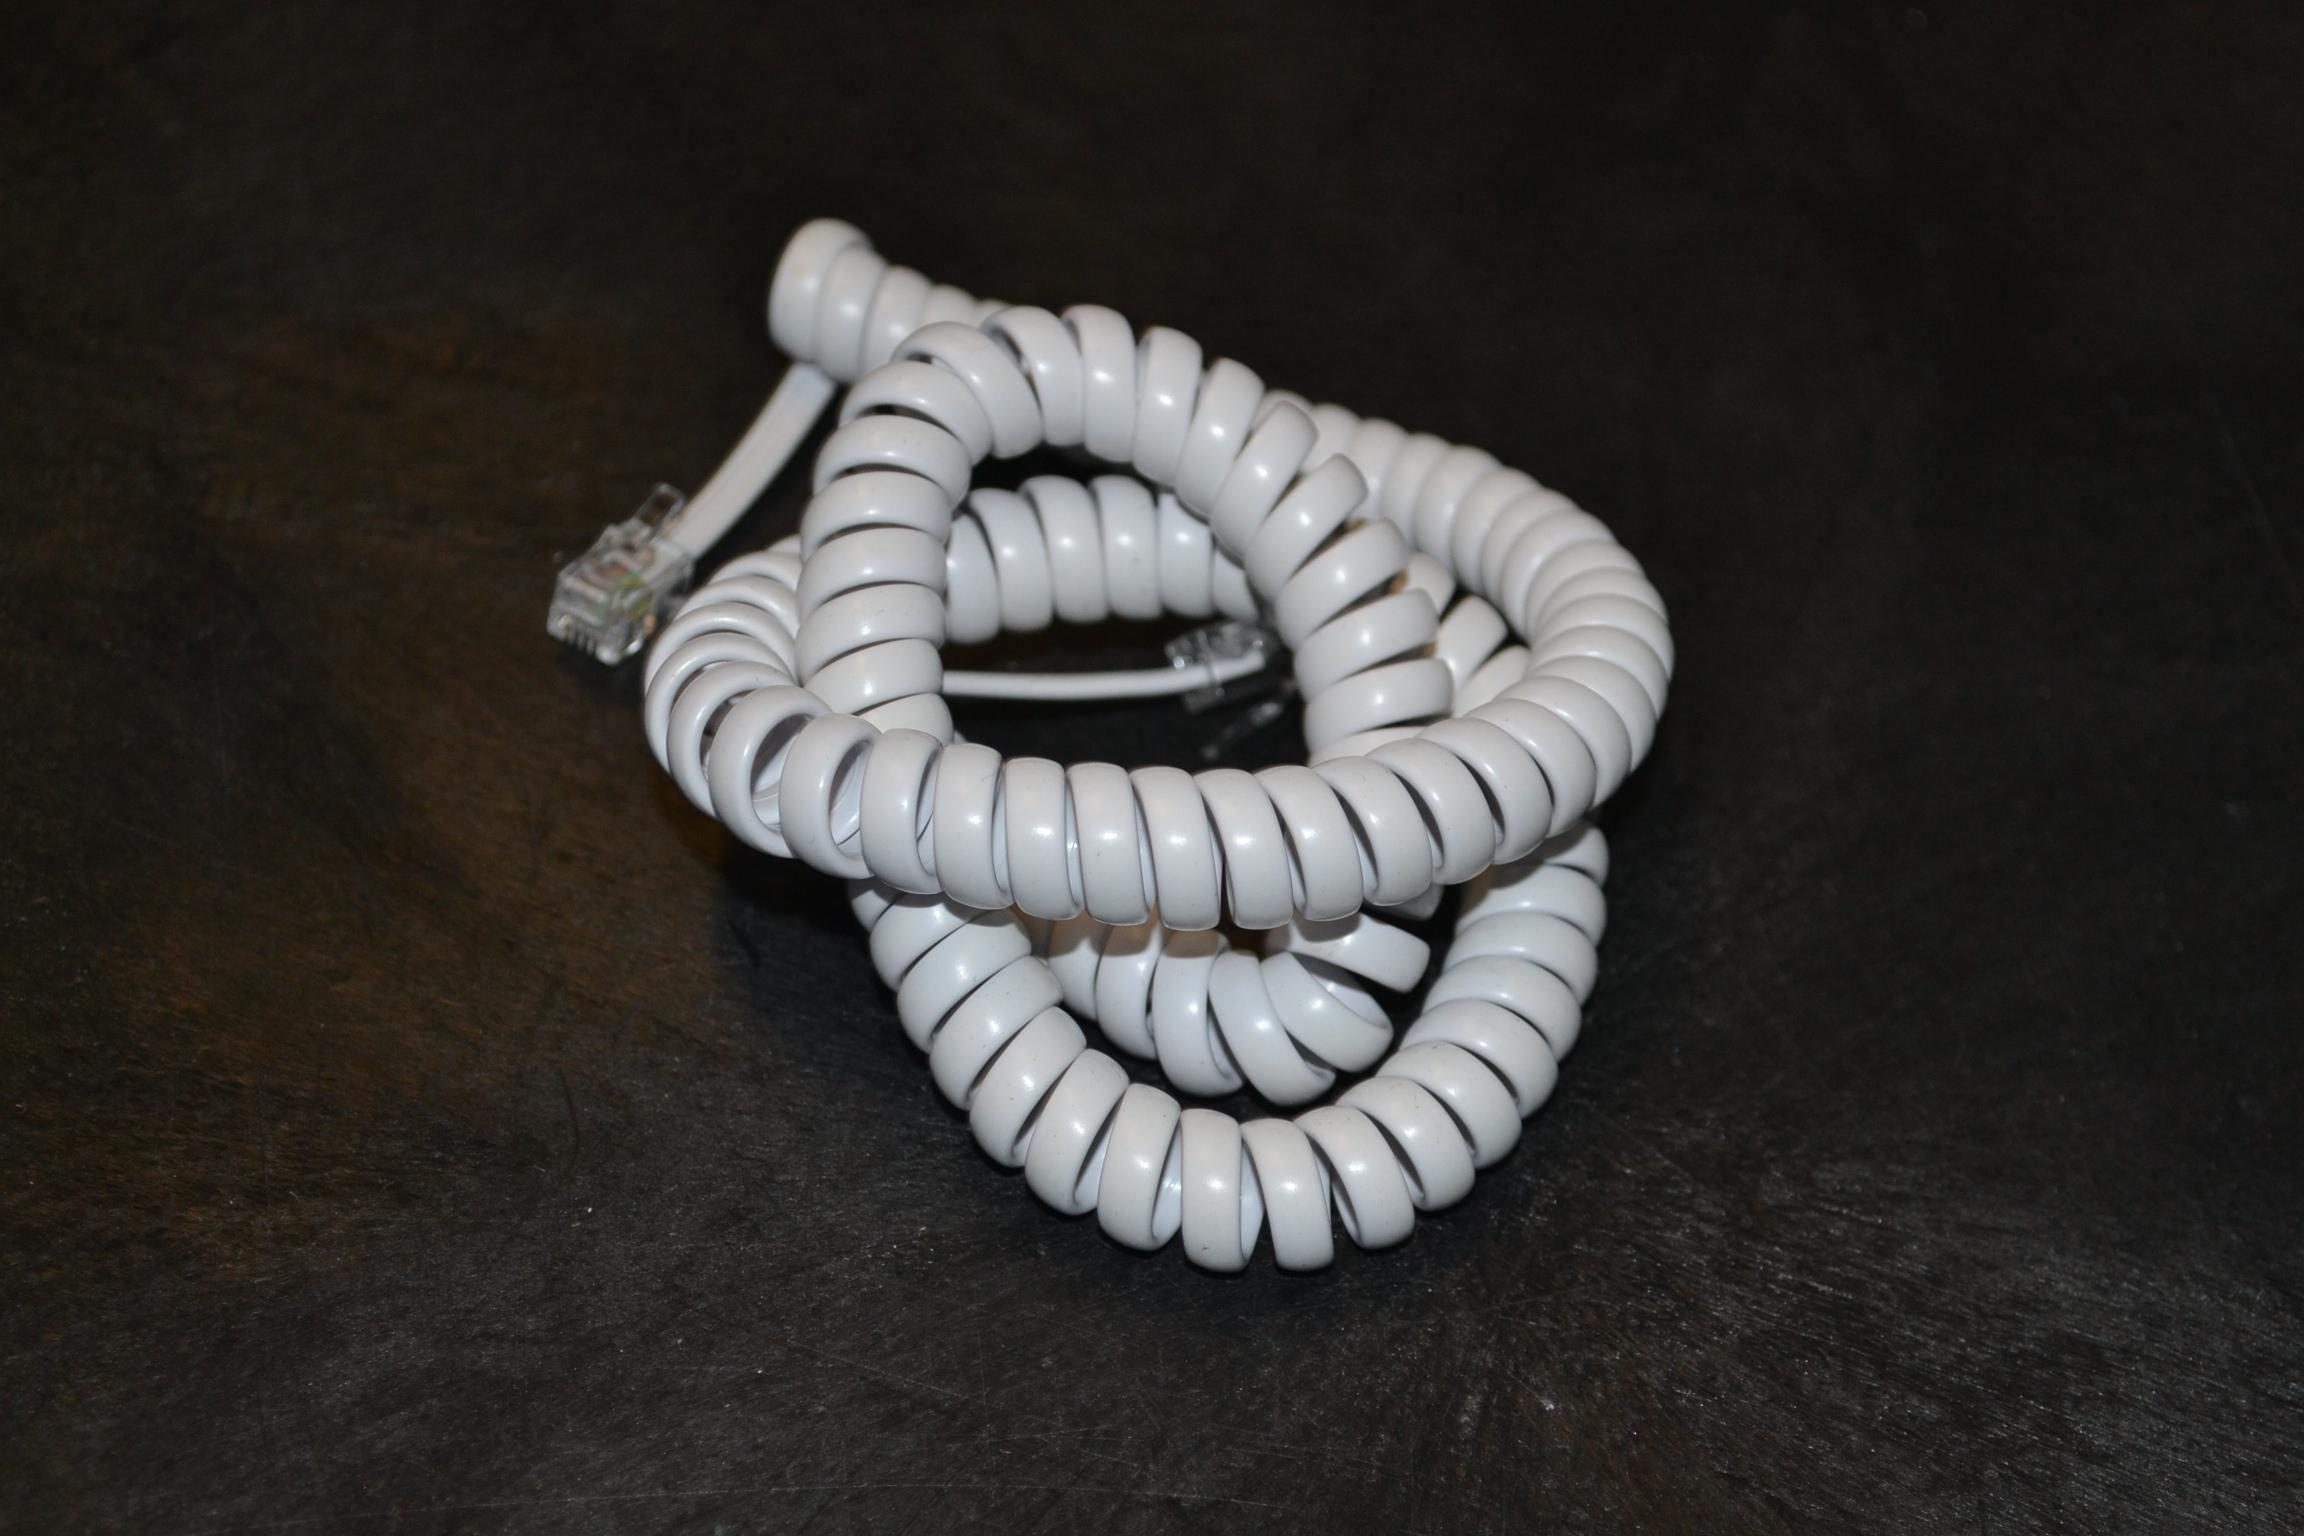 Jasco 12 White Handset Cord JAS-TL86175 Telephone